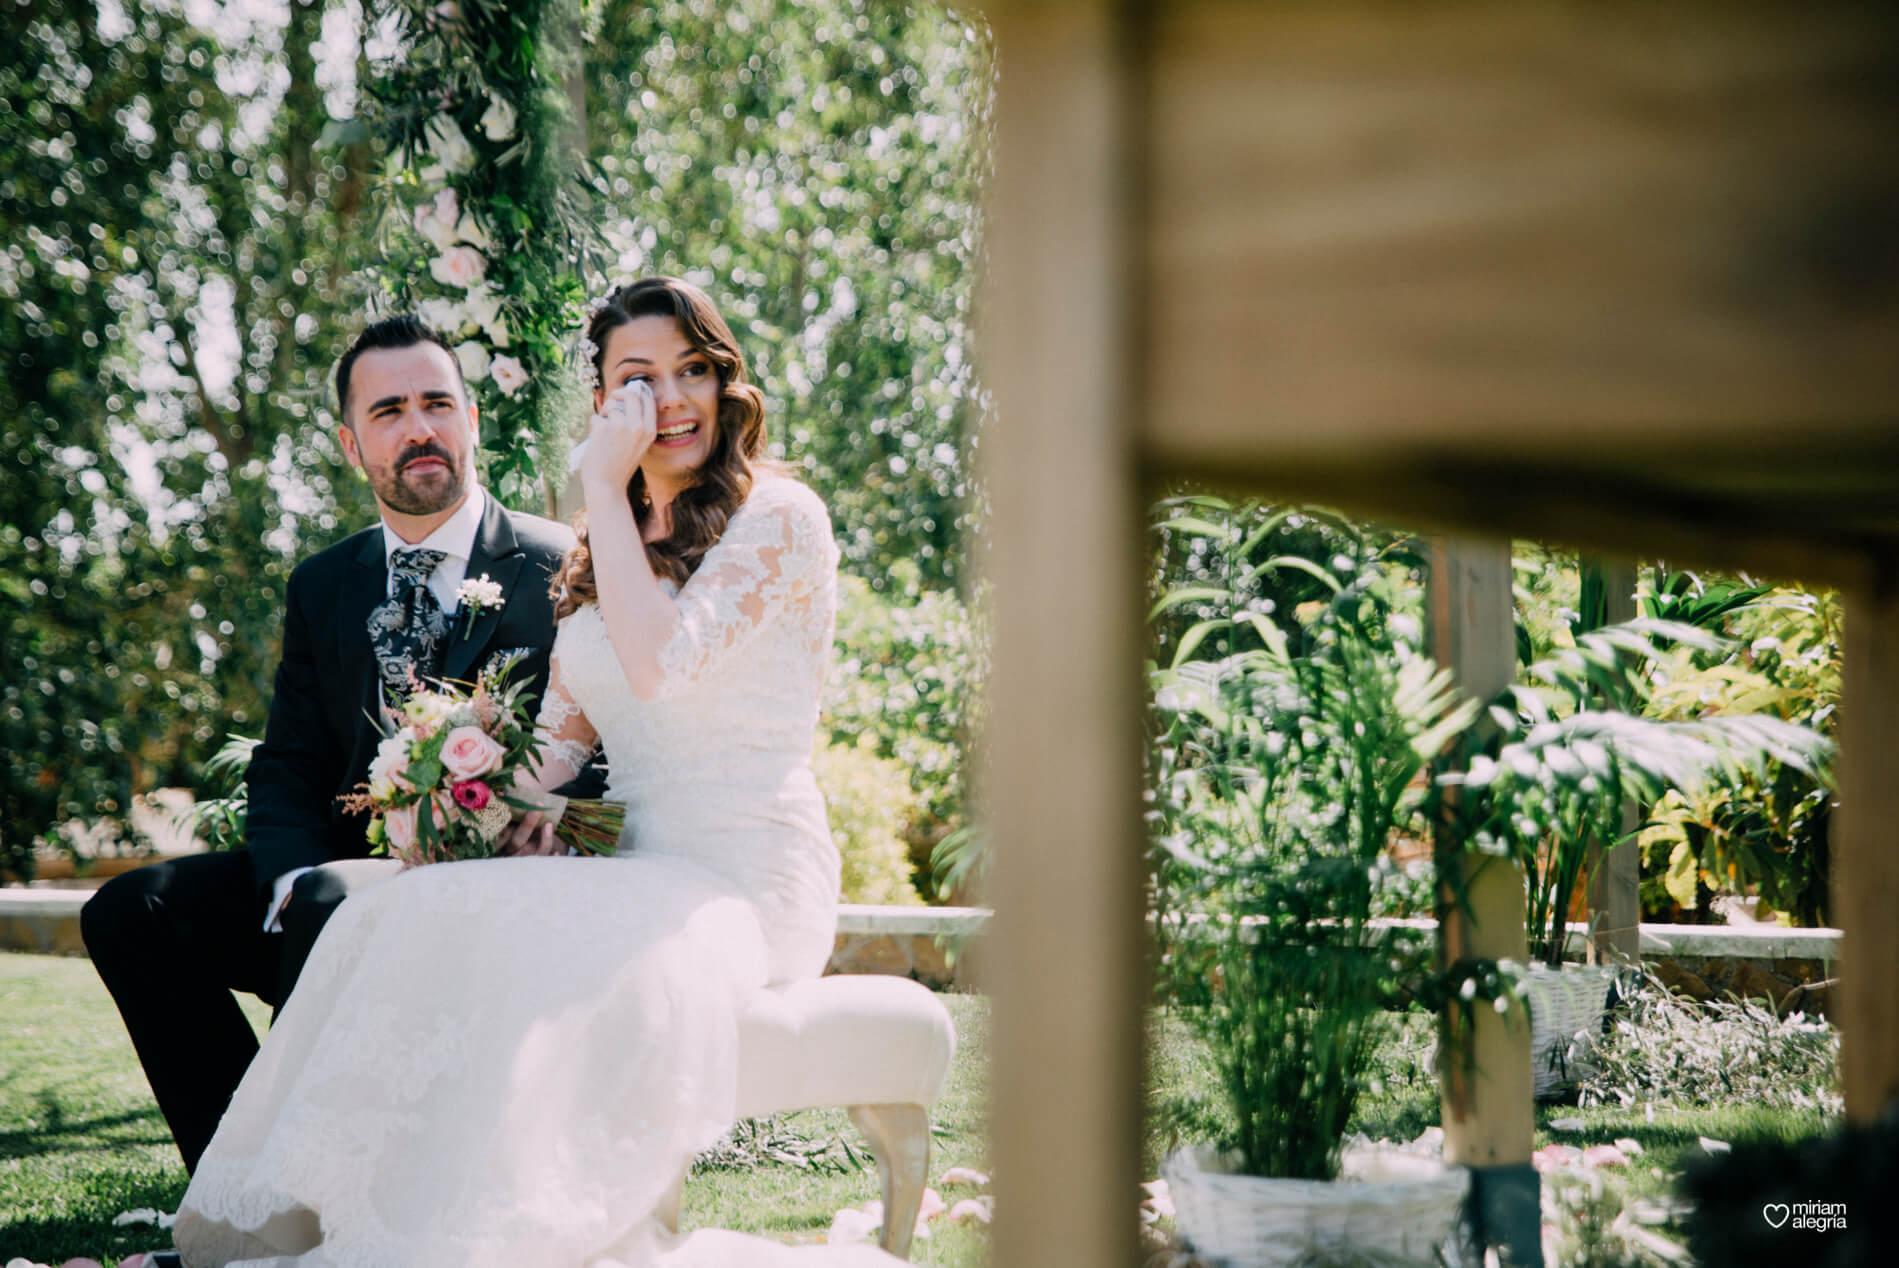 boda-en-finca-jurosa-miriam-alegria-54